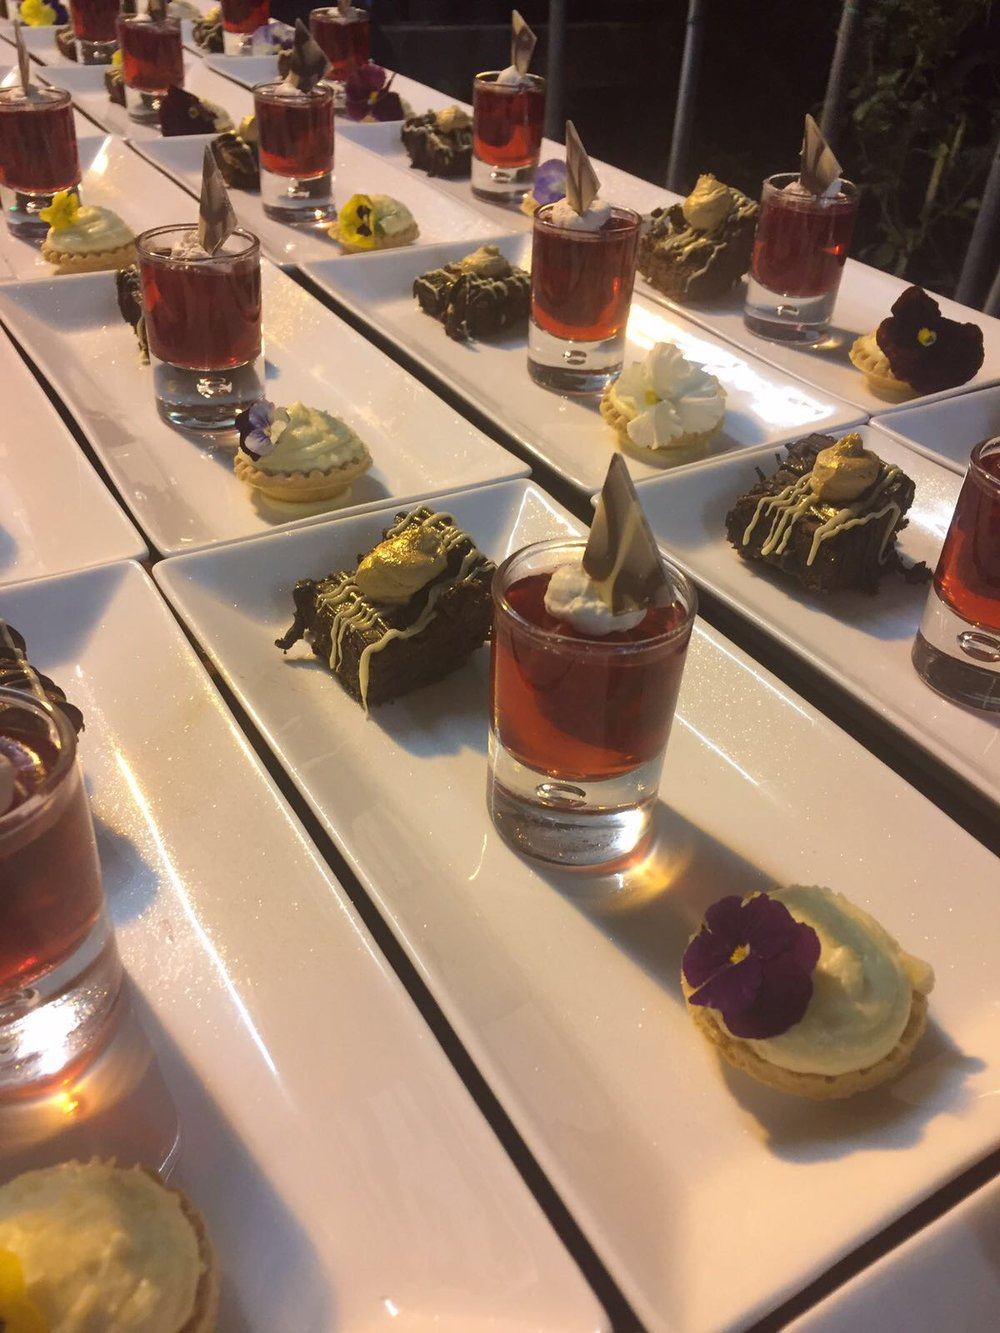 puddings-sarah-symington-catering-5.JPG